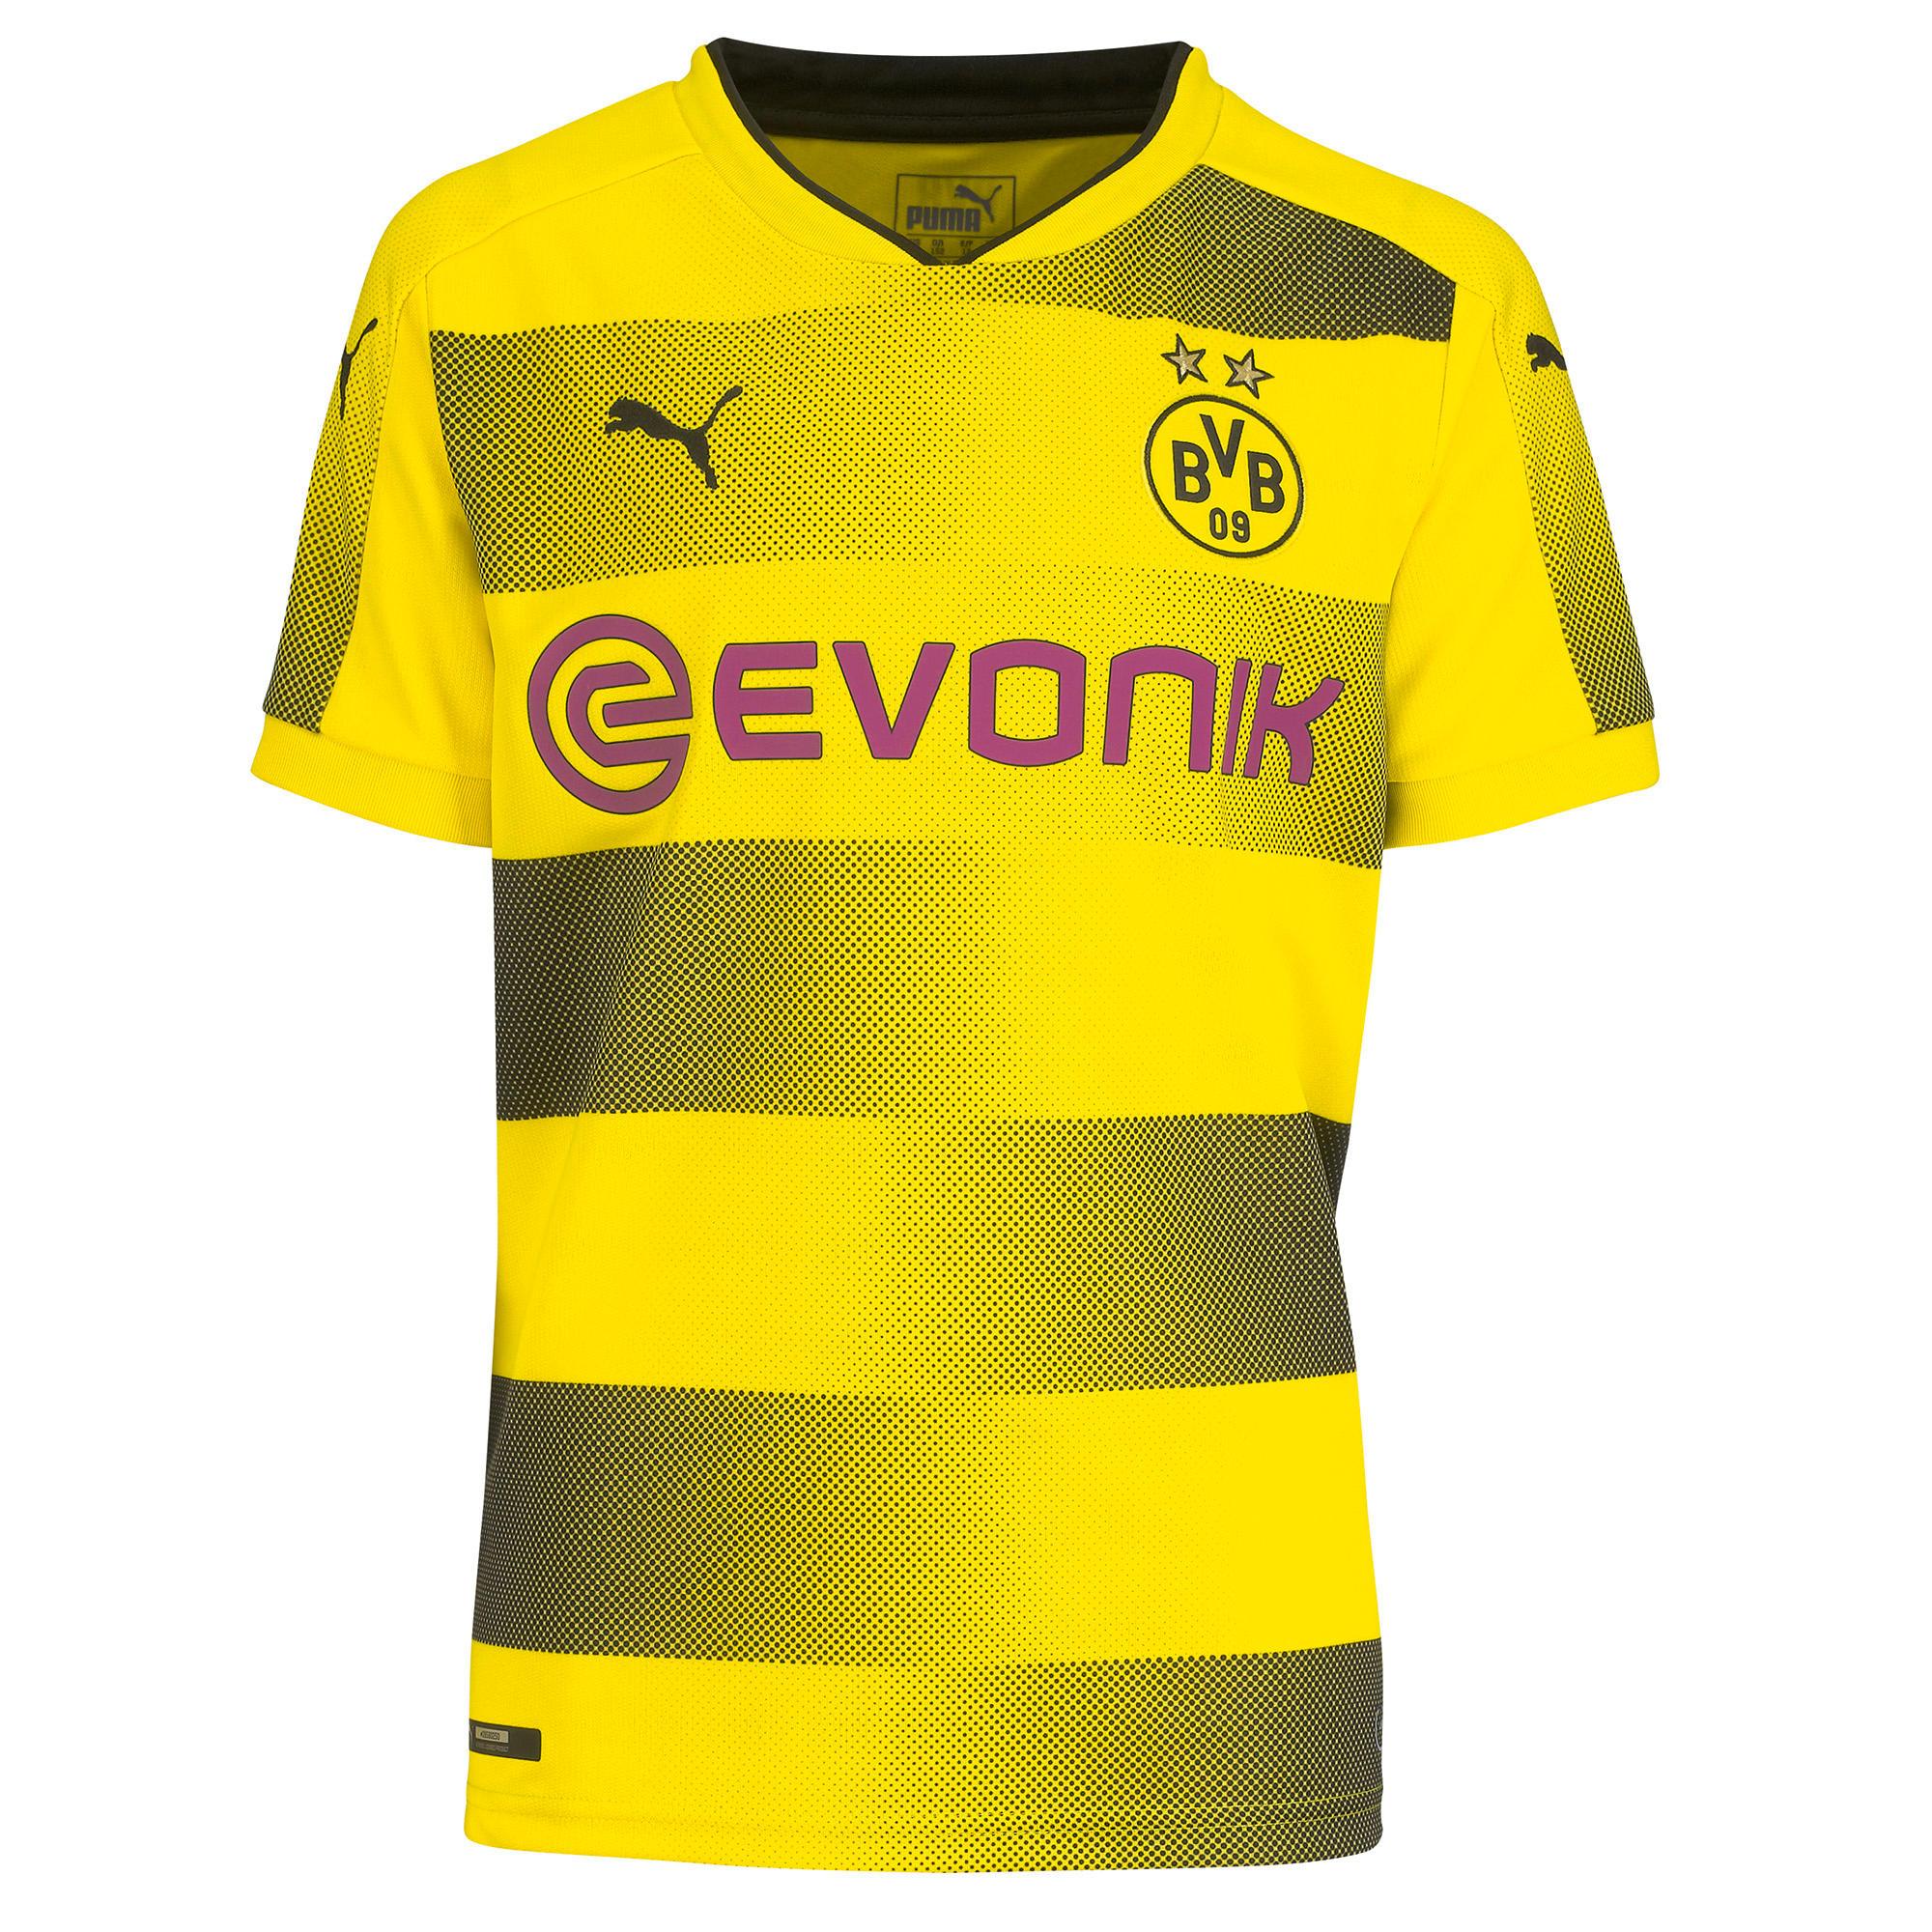 Puma Voetbalshirt Borussia Dortmund thuisshirt 17/18 voor kinderen geel